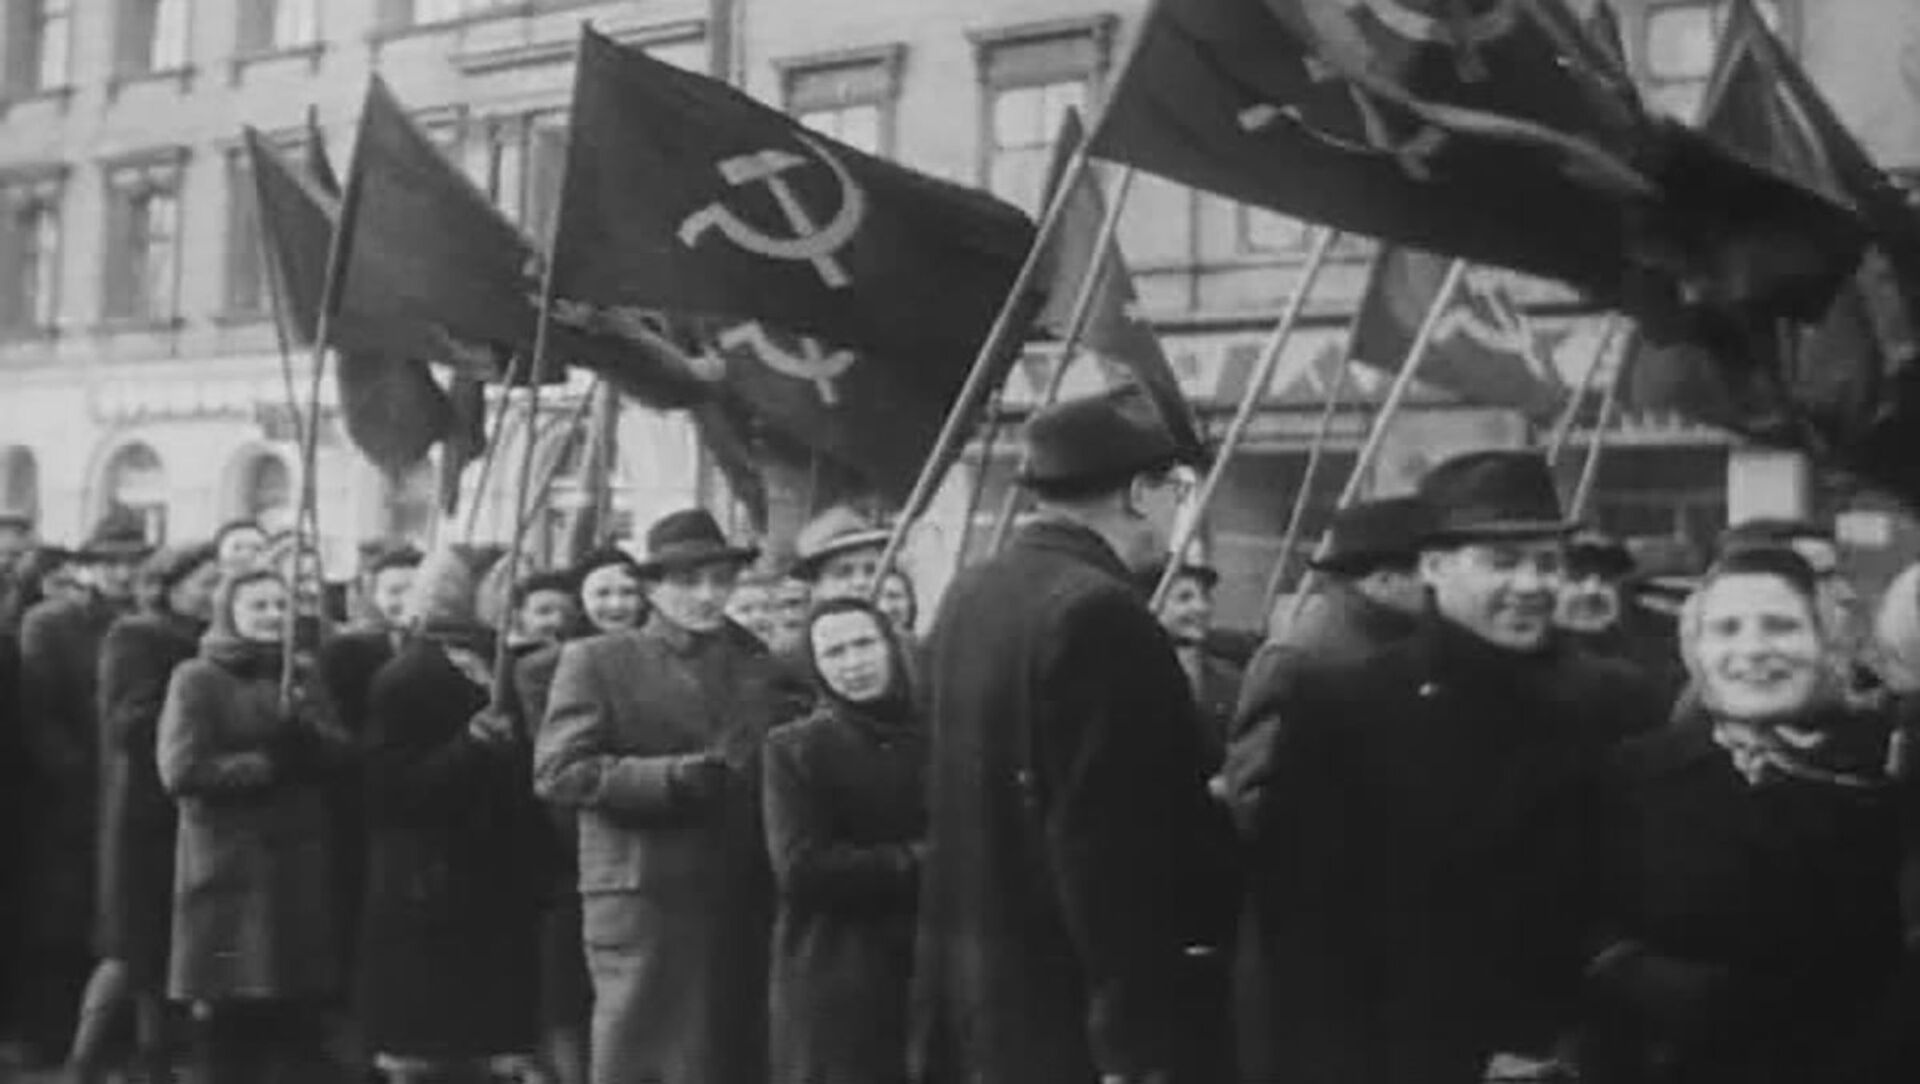 Prokomunističtí agitátoři, záběr z amerického filmového týdeníku The March of Time. - Sputnik Česká republika, 1920, 25.02.2021